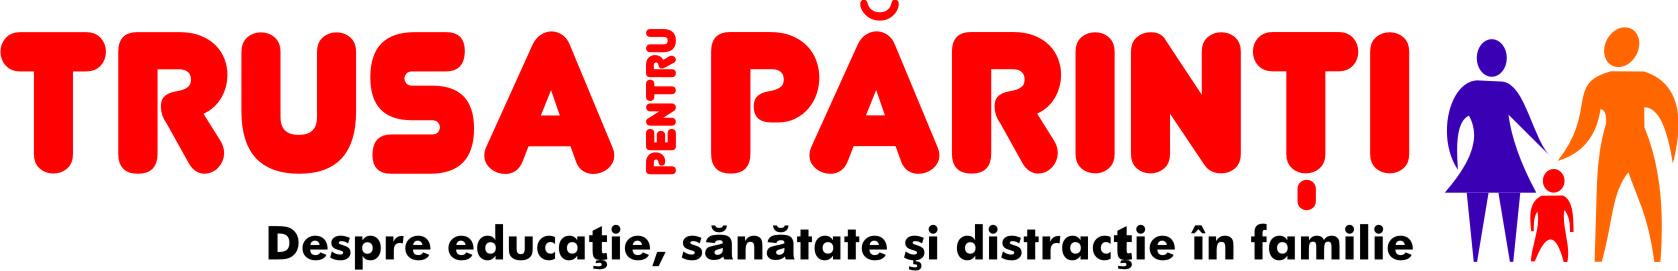 sigla Trusa pentru Parinti